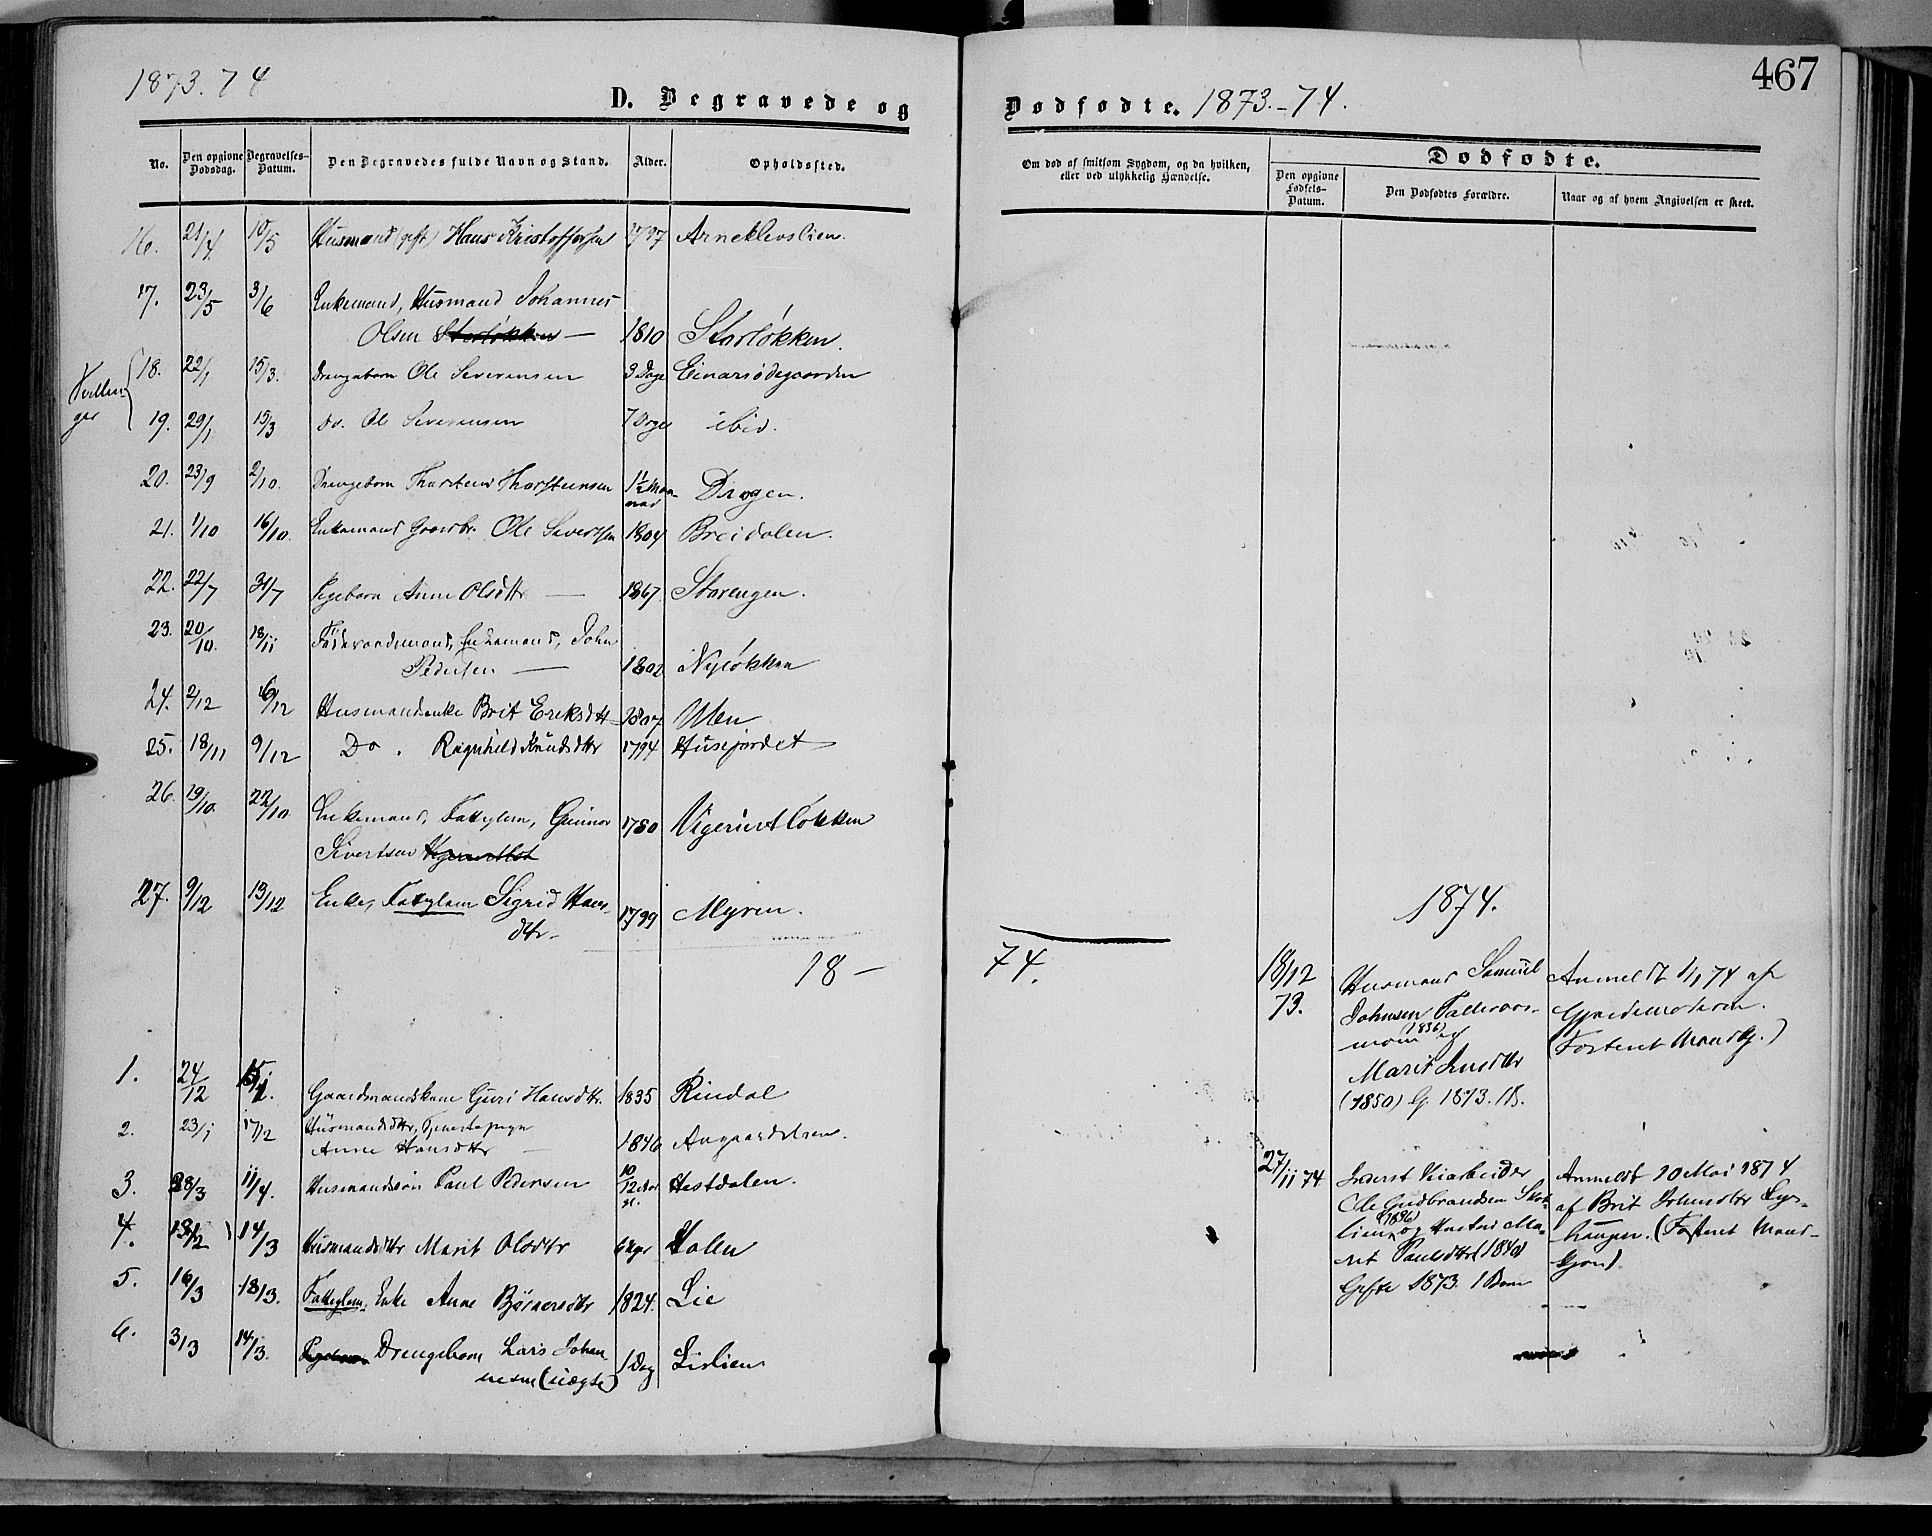 SAH, Dovre prestekontor, Ministerialbok nr. 1, 1854-1878, s. 467